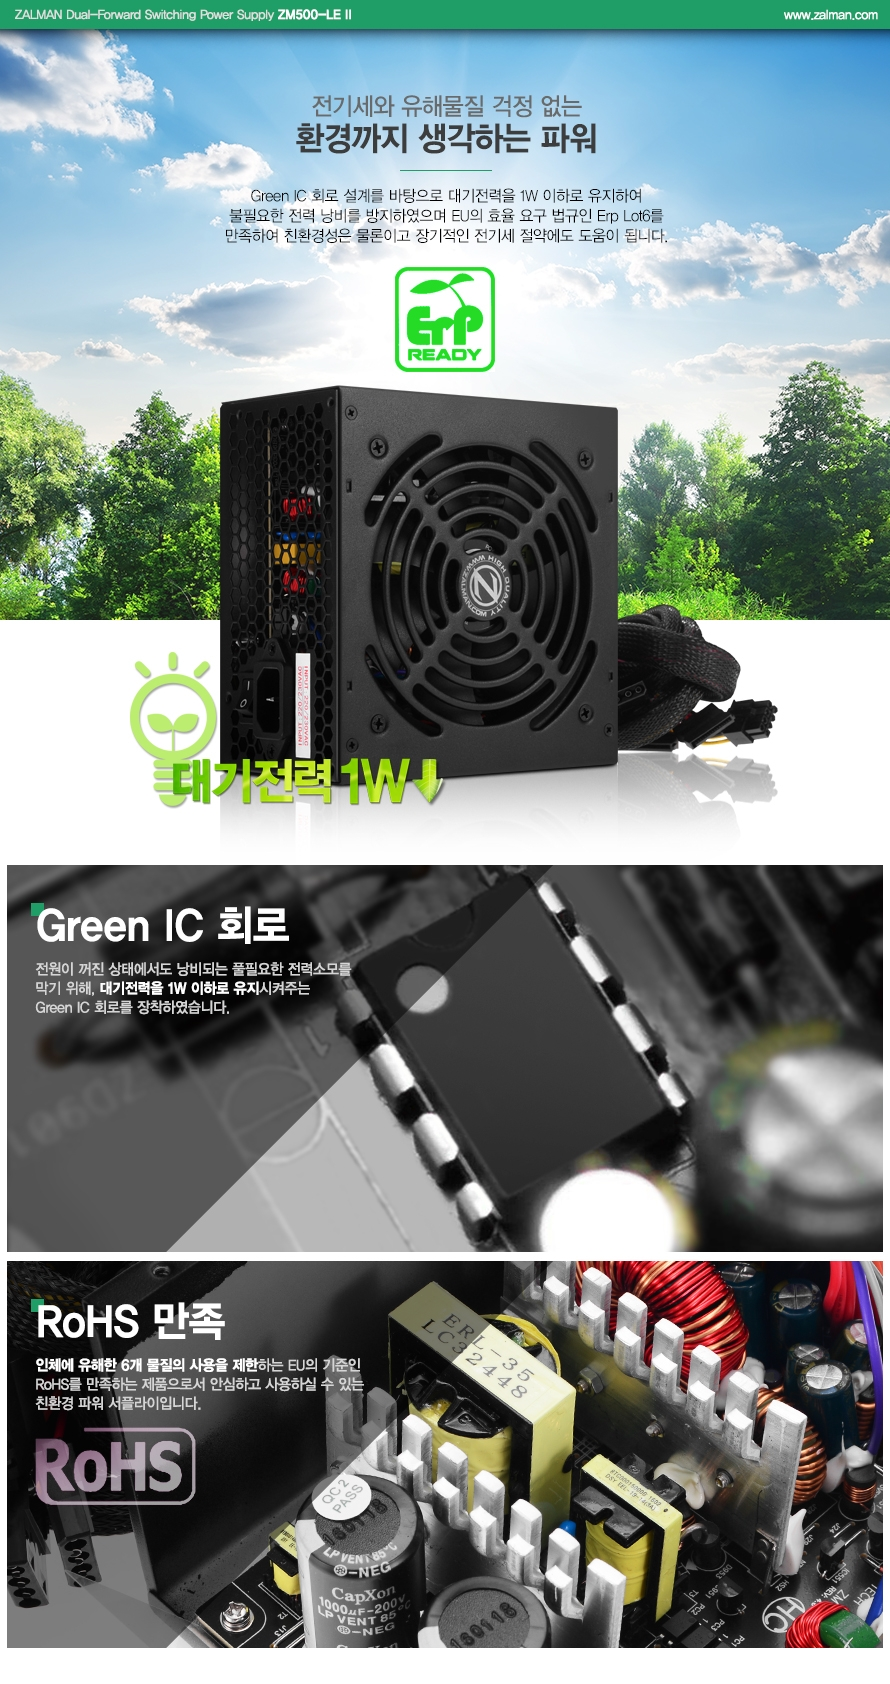 ZALMAN Dual-Forward Switching Power Supply ZM500-LE 2 / www.zalman.co.kr전기세와 유해물질 걱정없는 환경까지 생각하는 파워Green IC 회로 설계를 바탕으로 대기전력을 1W 이하로 유지하여 불필요한 전력 낭비를 방지하였으며 EU의 효율 연구 법규인 Erp Lot6를 만족하여 친환경성은 물론이고 장기적인 전기세 절약에도 도움이 됩니다. 대기전력 1WGreen IC 회로전원이 꺼진 상태에서도 낭비되는 불필요한 전력소모를 막기 위해, 대기전력을 1W 이하로 유지시켜주는 Green IC 회로를 장착하였습니다.RoHS 만족인체에 유해한 6개 물질의 사용을 제한하는 EU의 기준인 RoHS를 만족하는 제품으로서 안심하고 사용하실 수 있는 친환경 파워 서플라이 입니다.